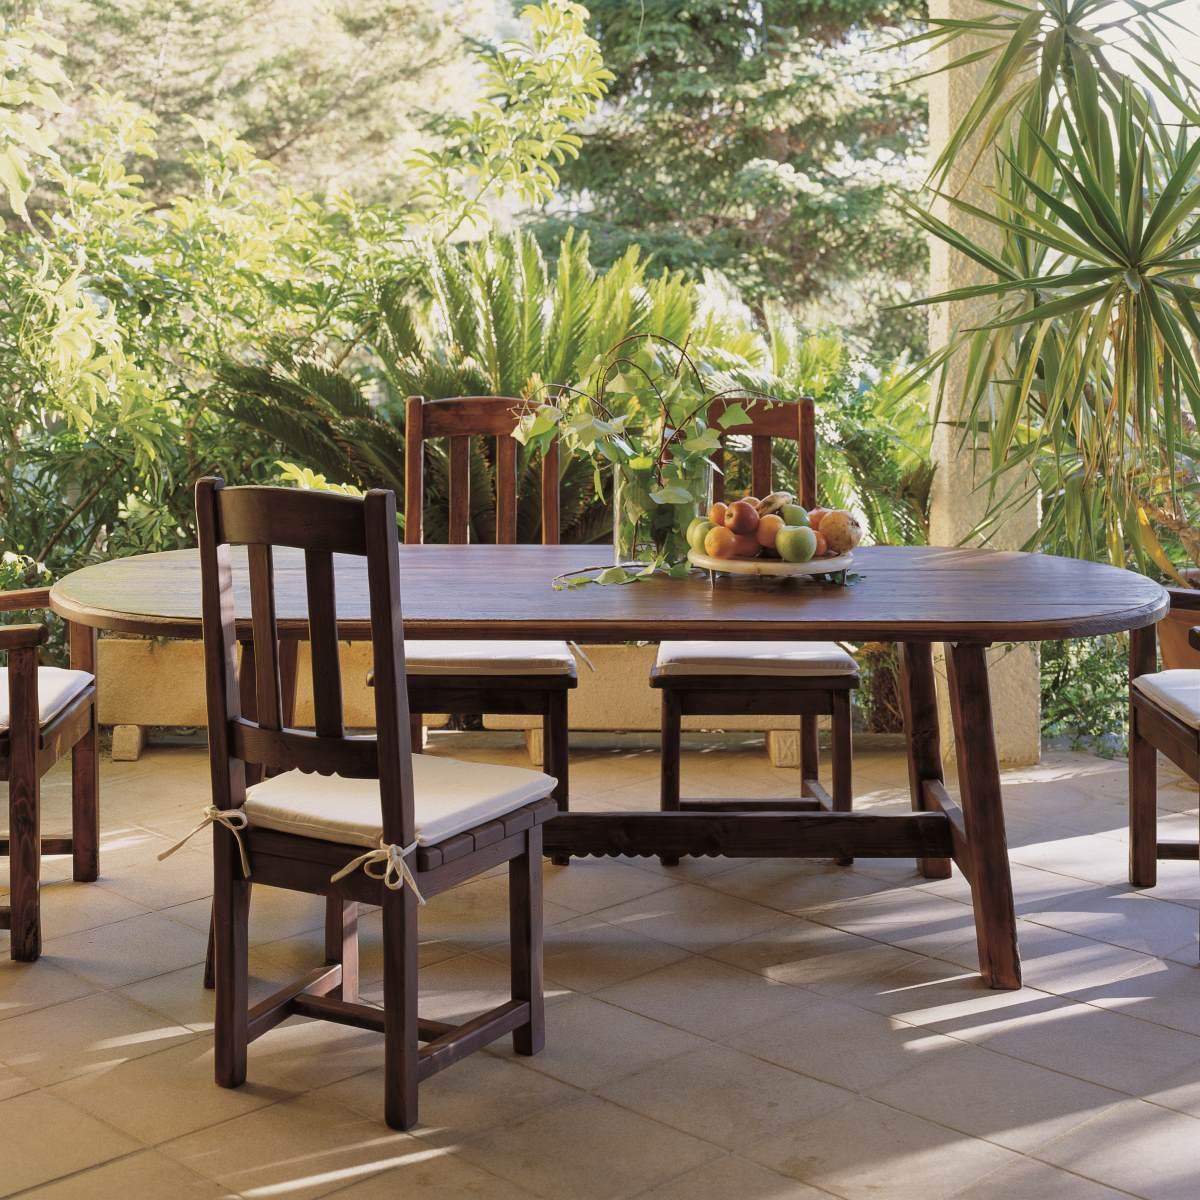 Mesa r stica ovalada 240 ecor stico venta de muebles - Mesa ovalada ikea ...